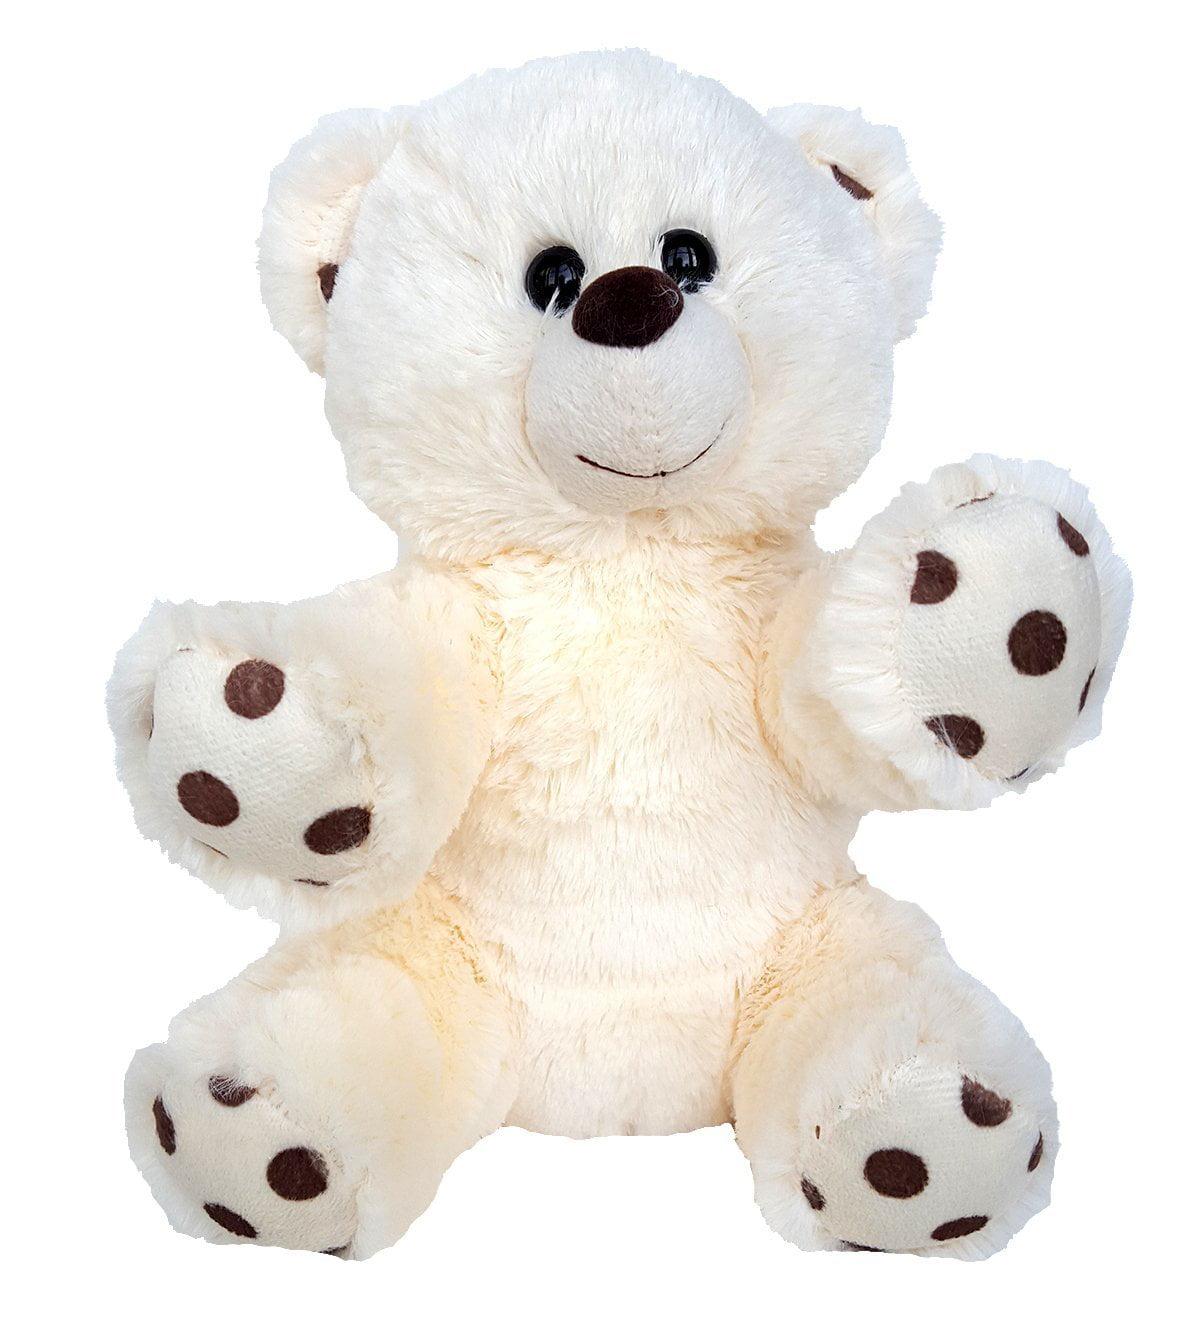 Cuddly Soft 8 inch Stuffed Polka Dot Bear...We stuff 'em...you love 'em!